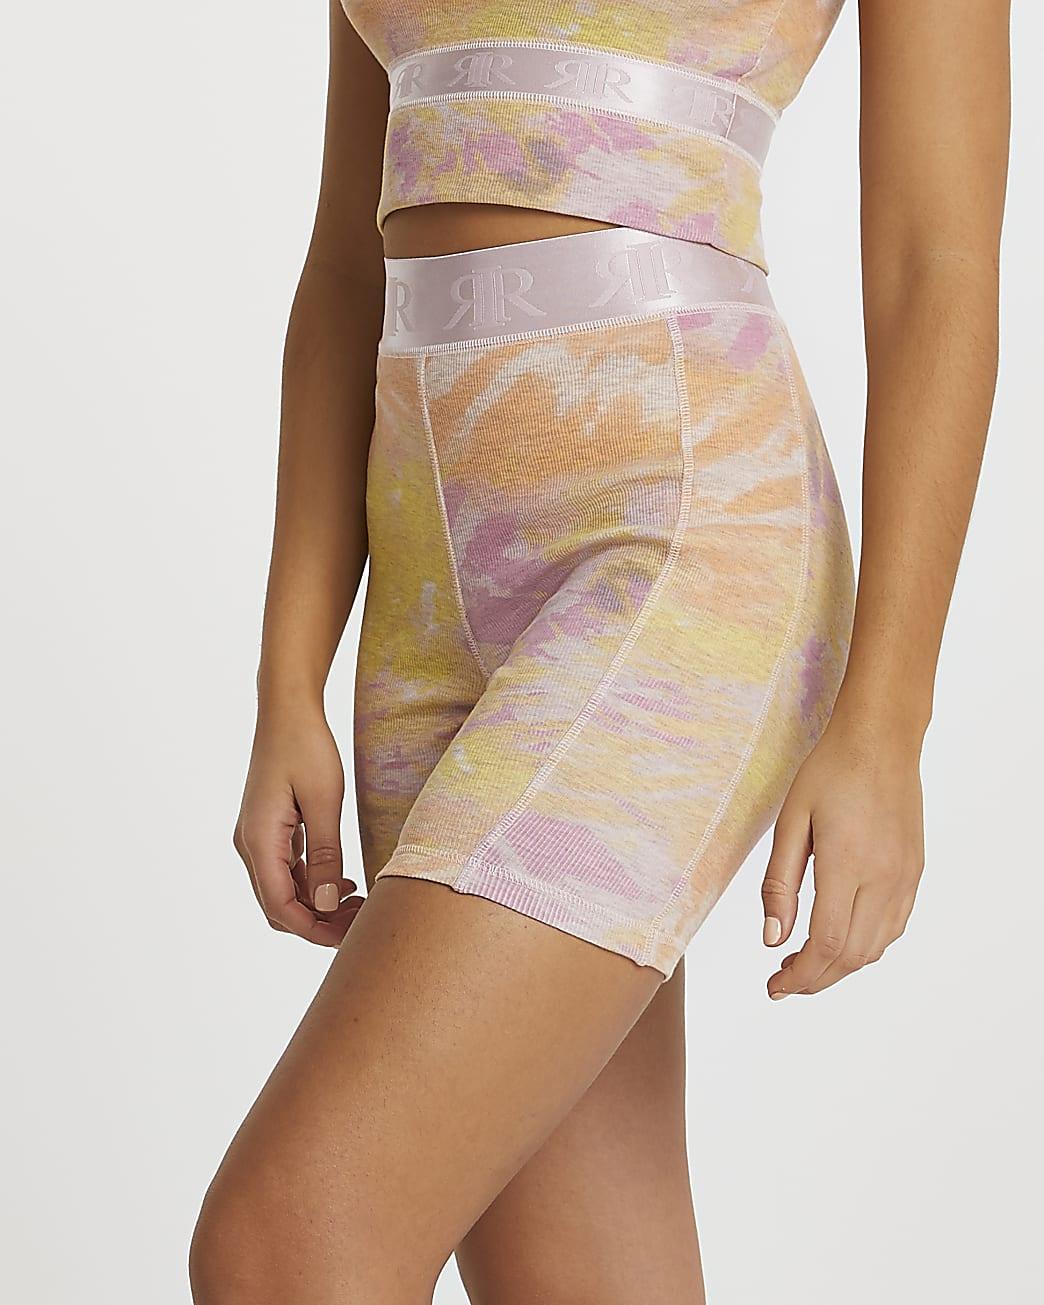 Pink Intimates tie dye ribbed cycling shorts